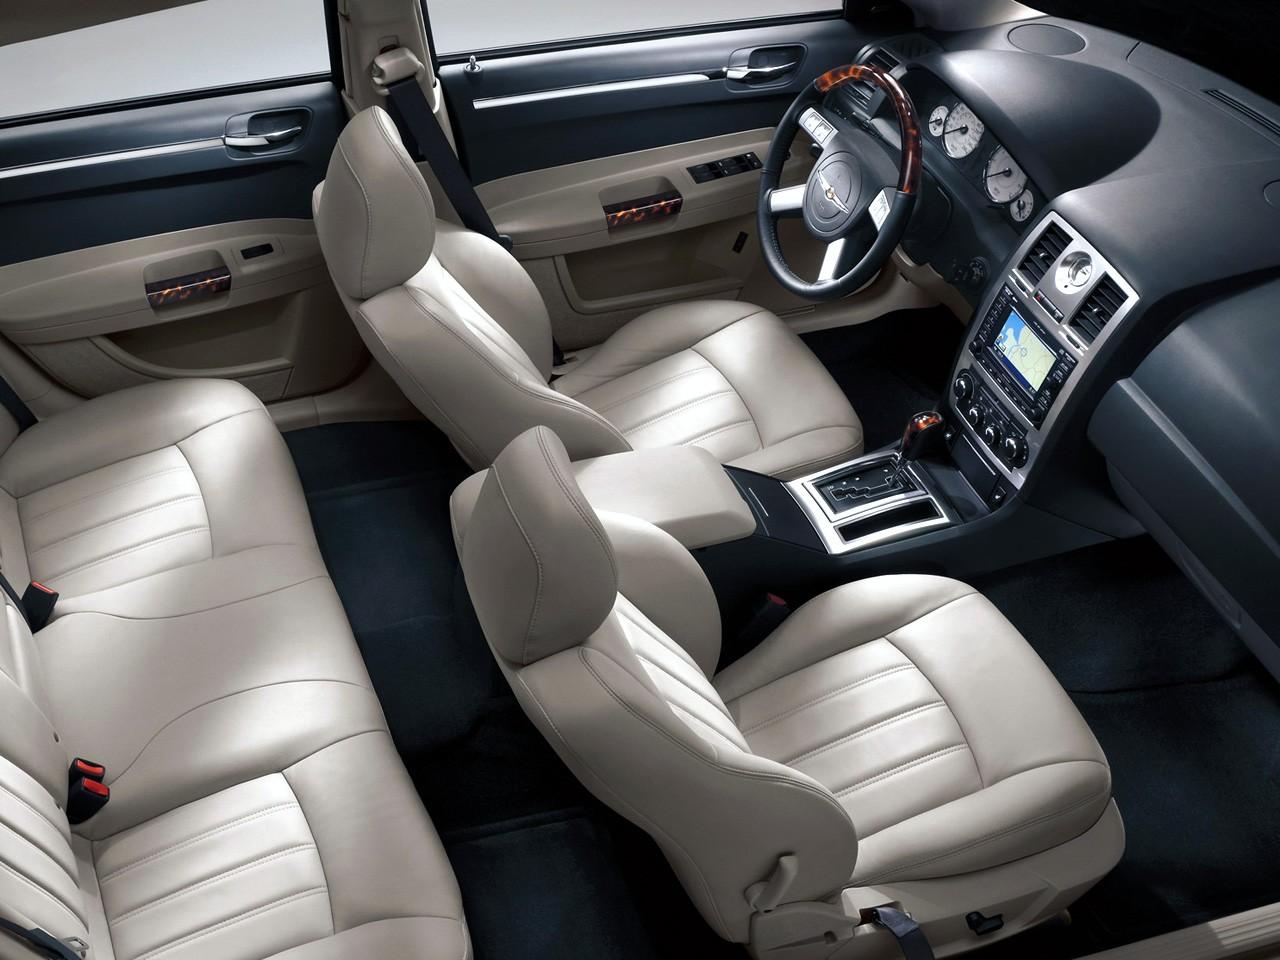 Chrysler 2007 chrysler 300c specs : CHRYSLER 300C specs - 2004, 2005, 2006, 2007, 2008, 2009, 2010 ...